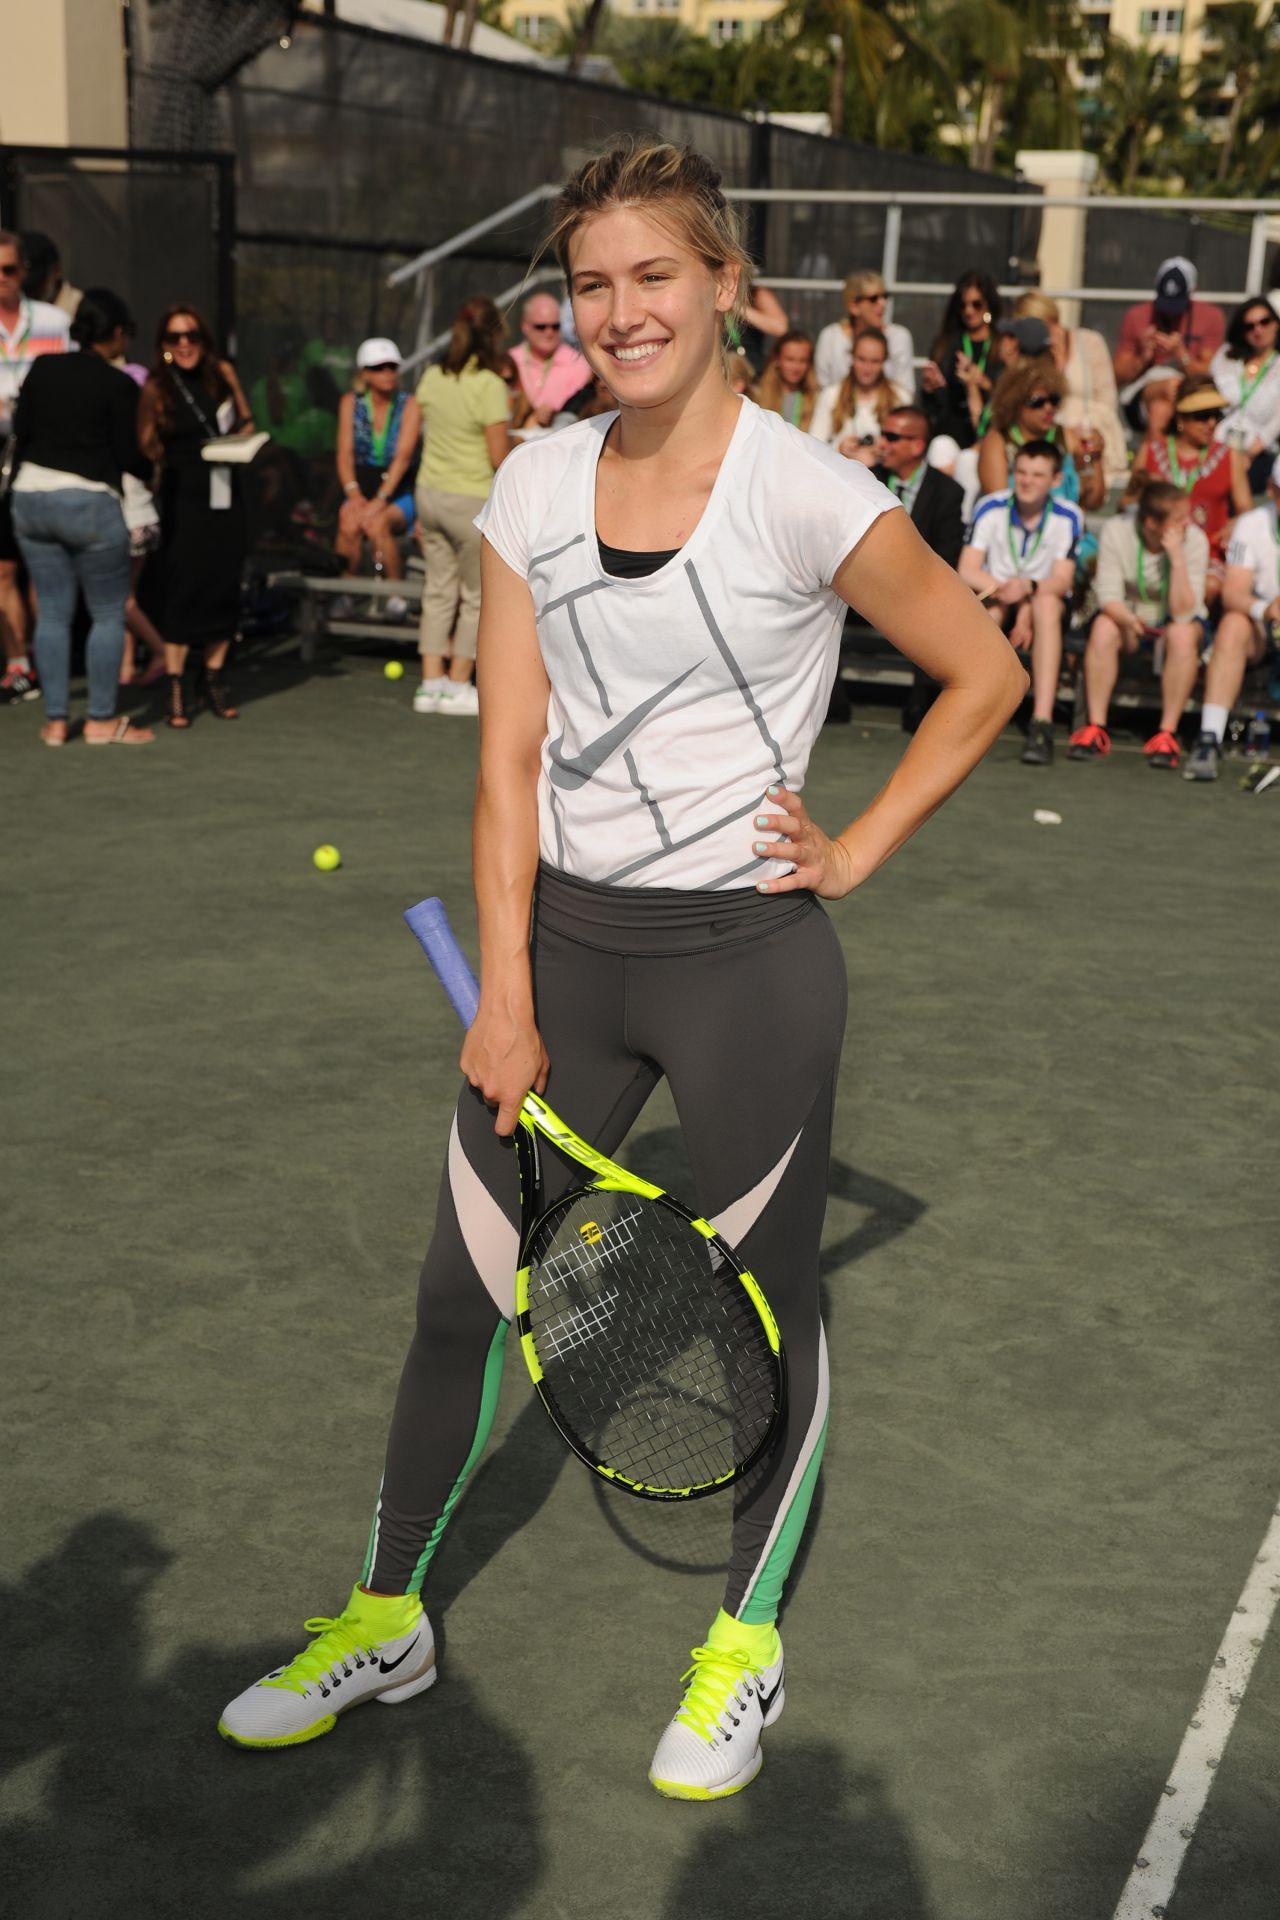 Chris Evert Charity Tennis Event Attracts Celebrities ...